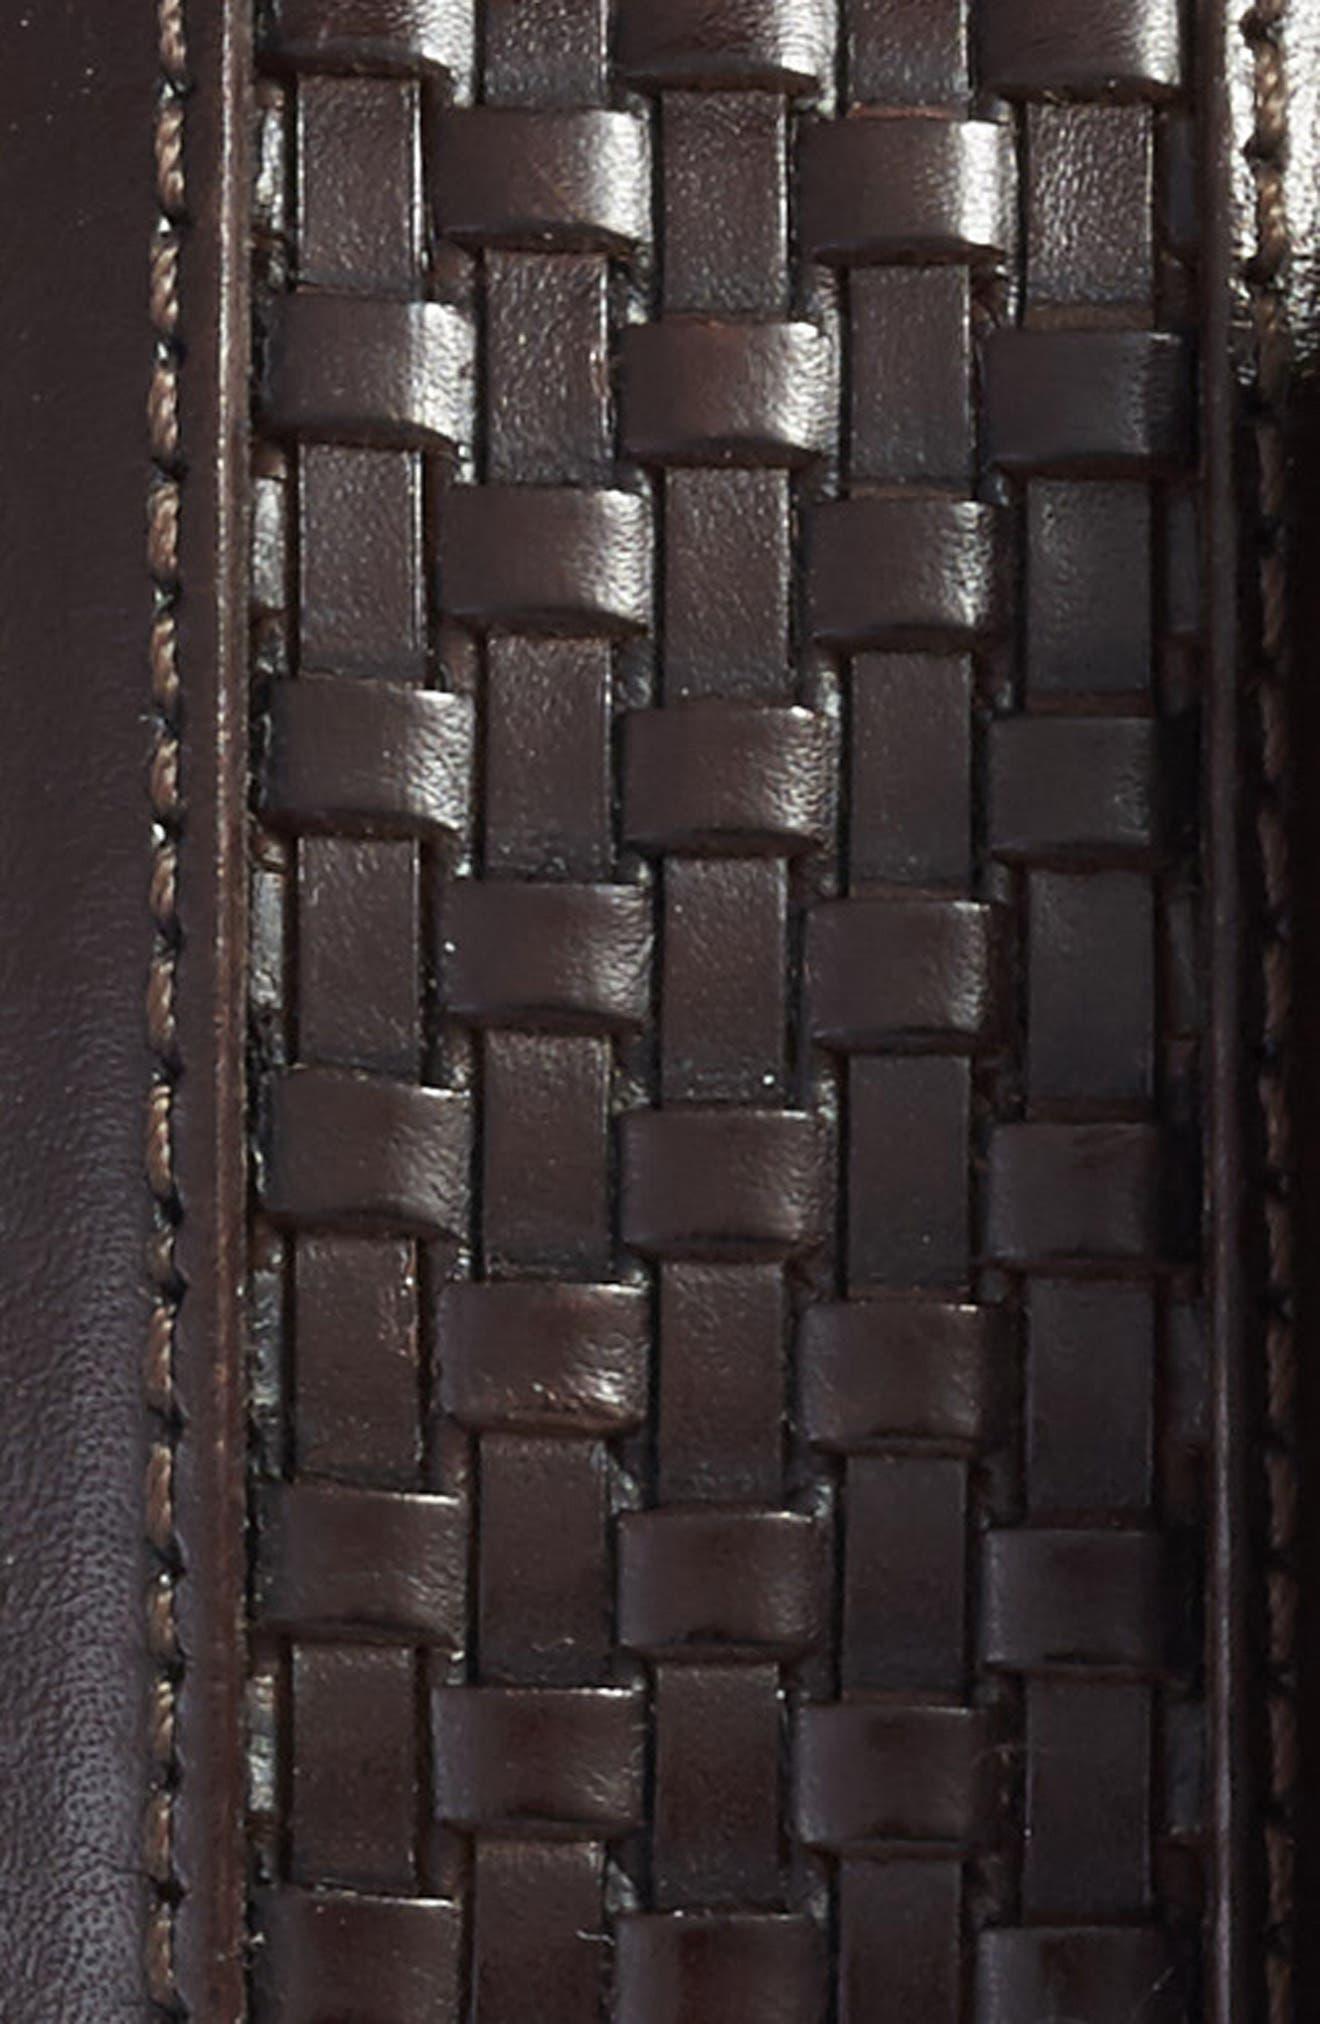 Parma Woven Leather Belt,                             Alternate thumbnail 2, color,                             Brown